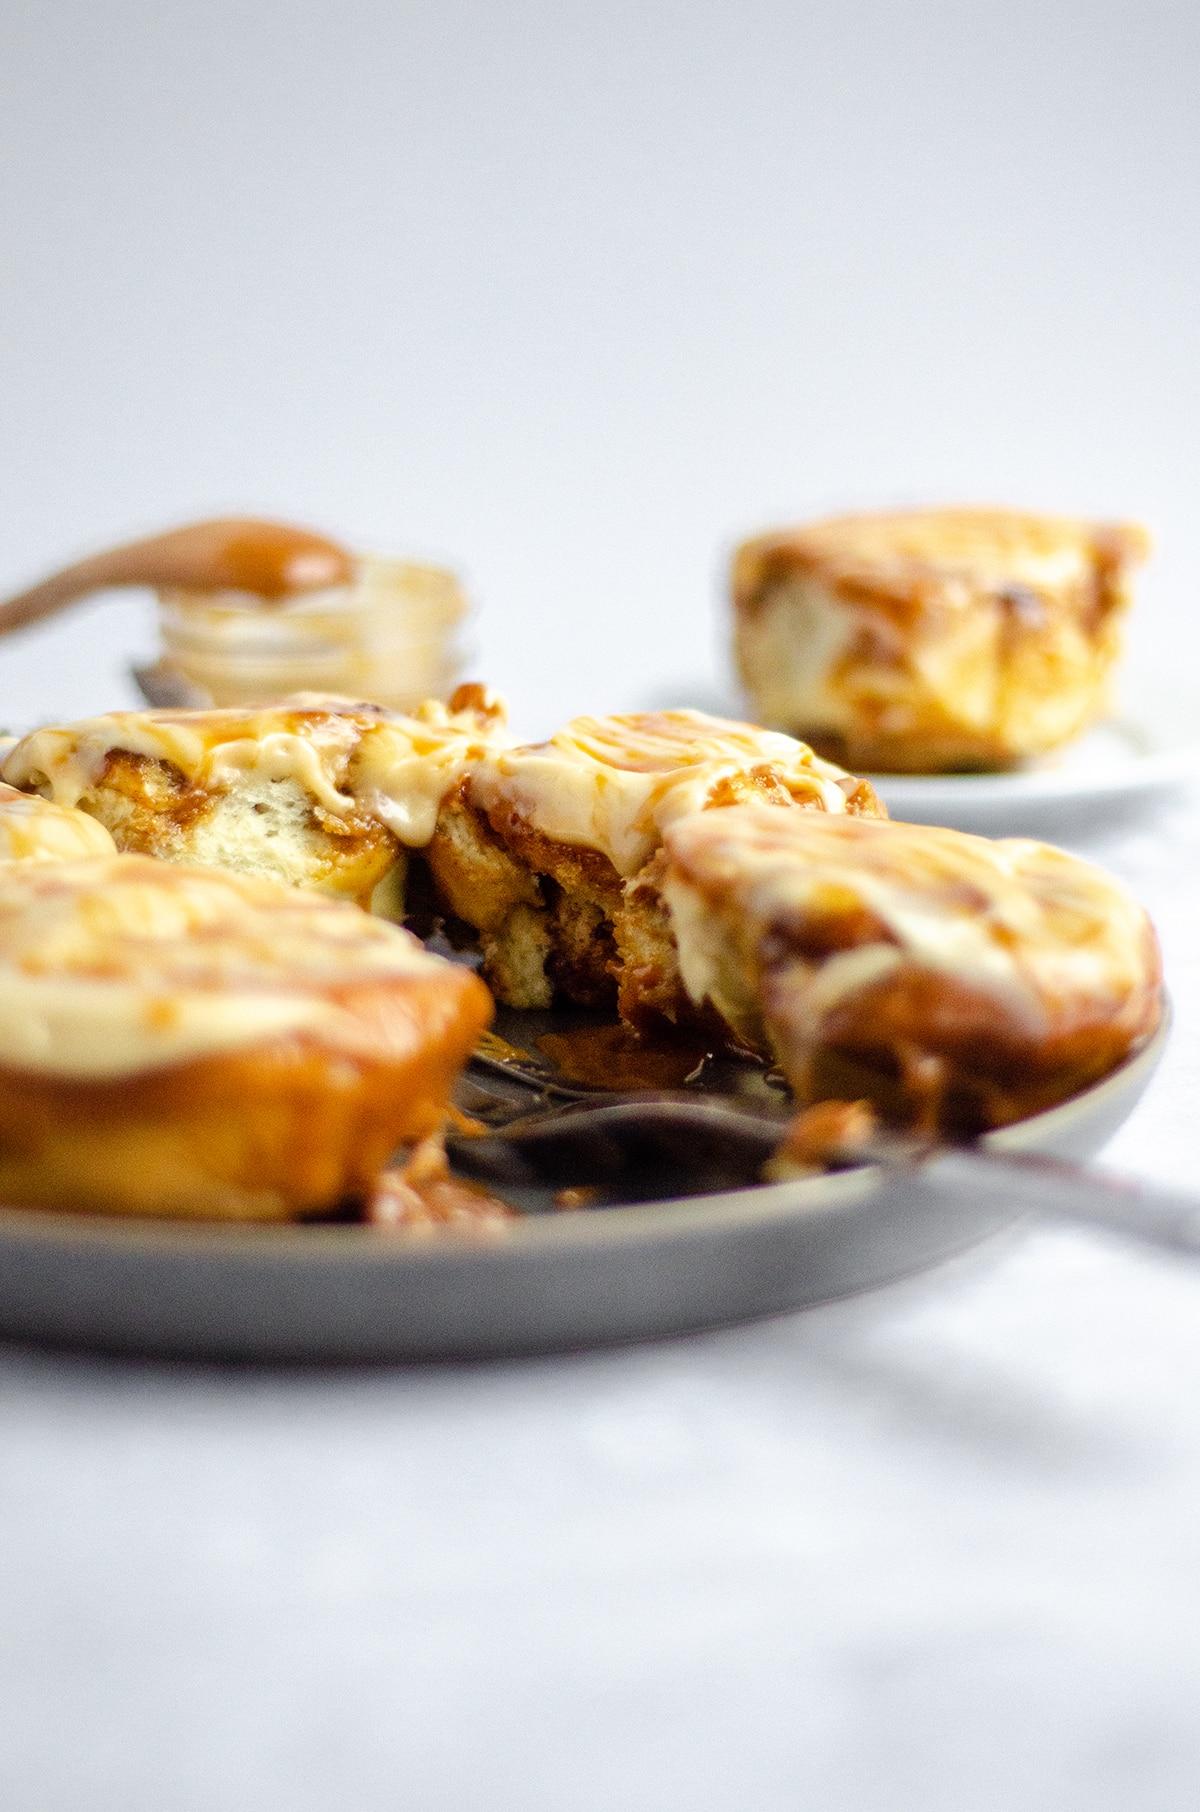 caramel rolls on a serving plate